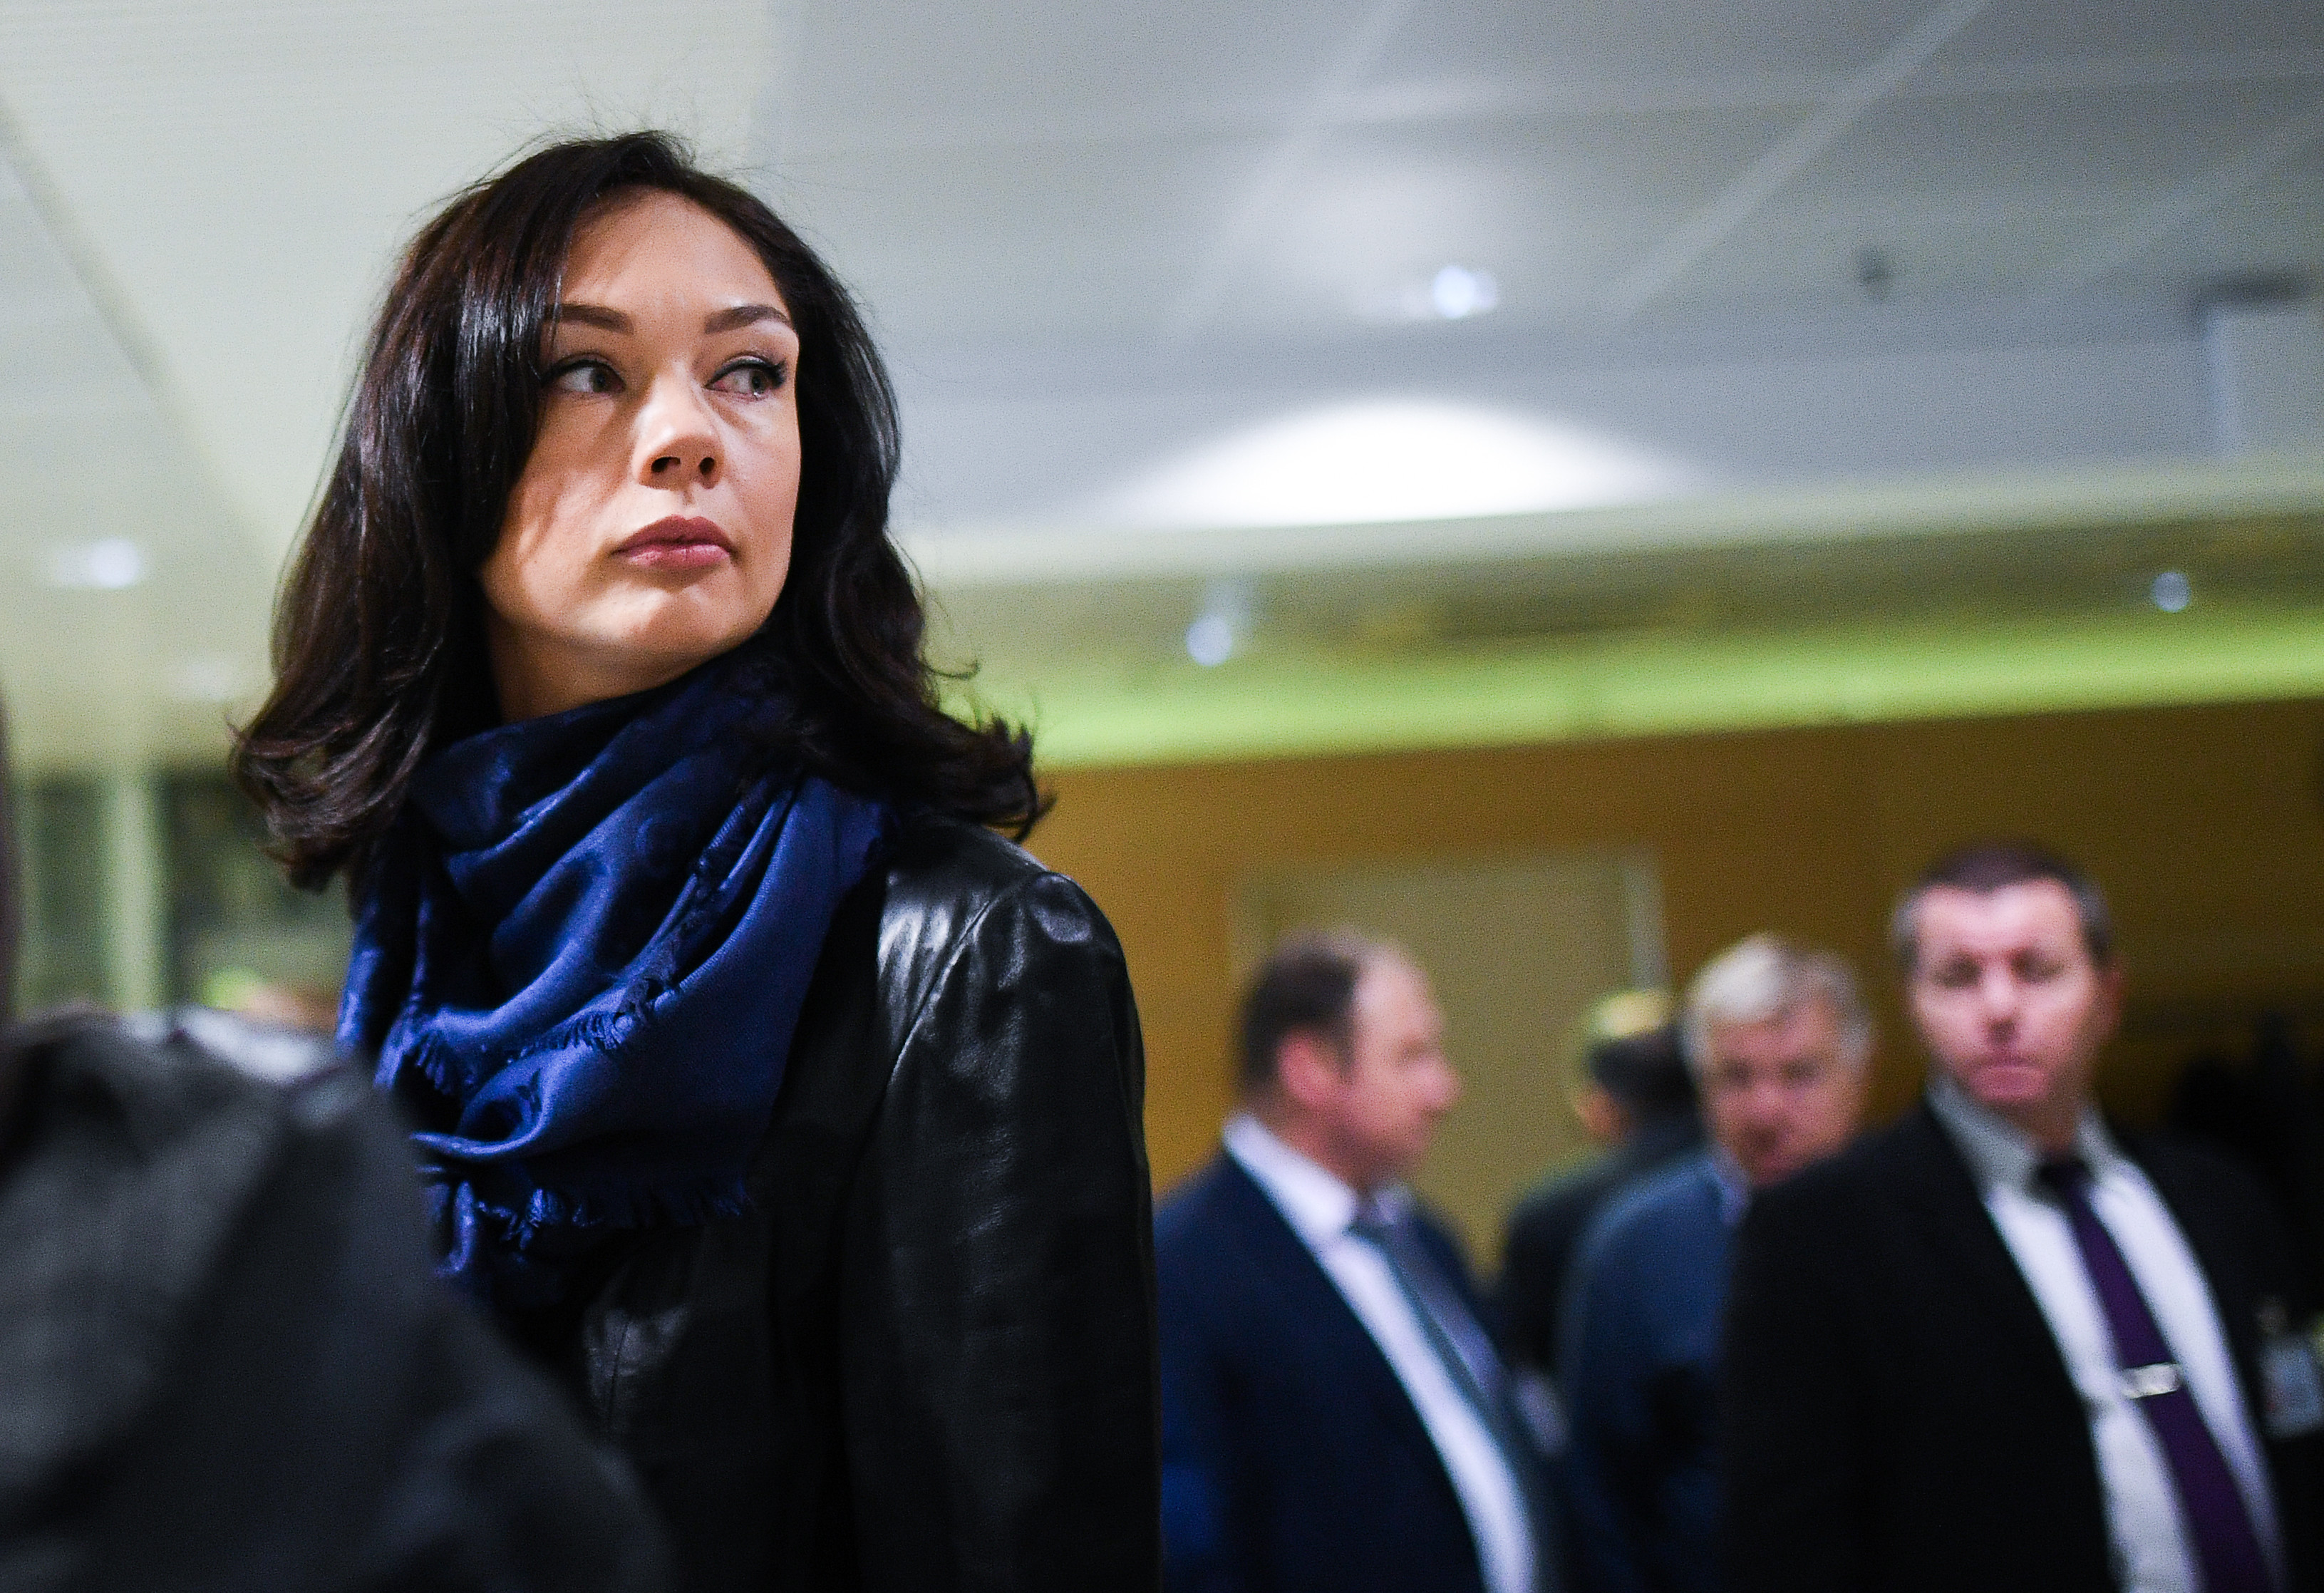 <p>Екатерина Гамова.<strong><span>&nbsp;</span></strong>Фото: &copy; РИА Новости/Александр Вильф</p>